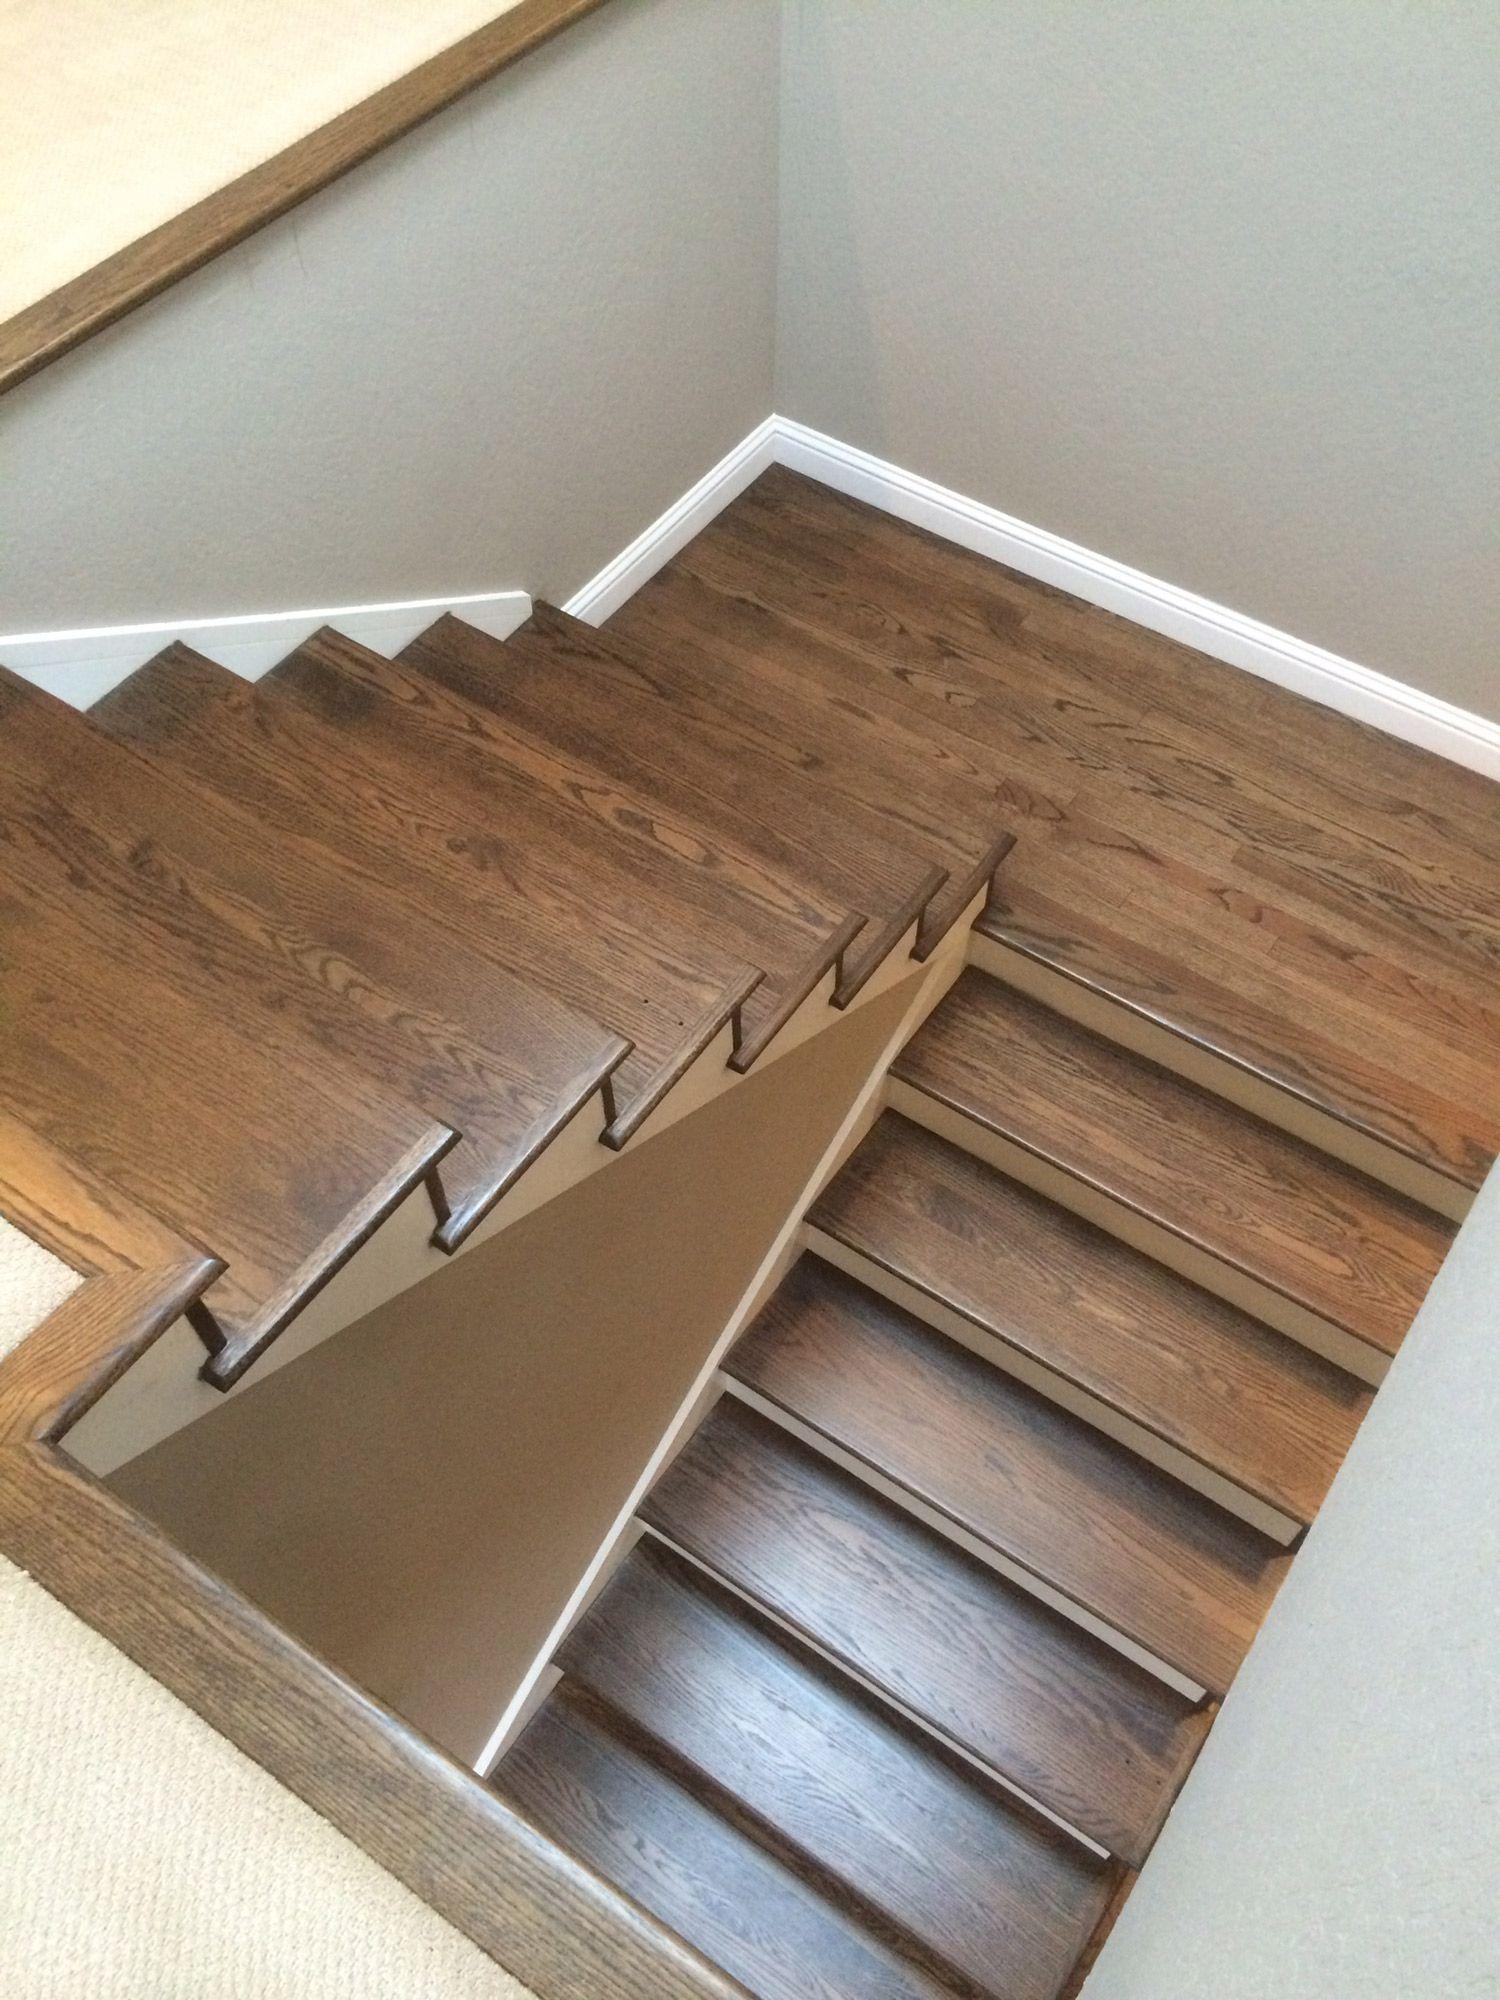 Best Red Oak Refinish Lafayette Dark Stain Stairs Wood Floor 400 x 300